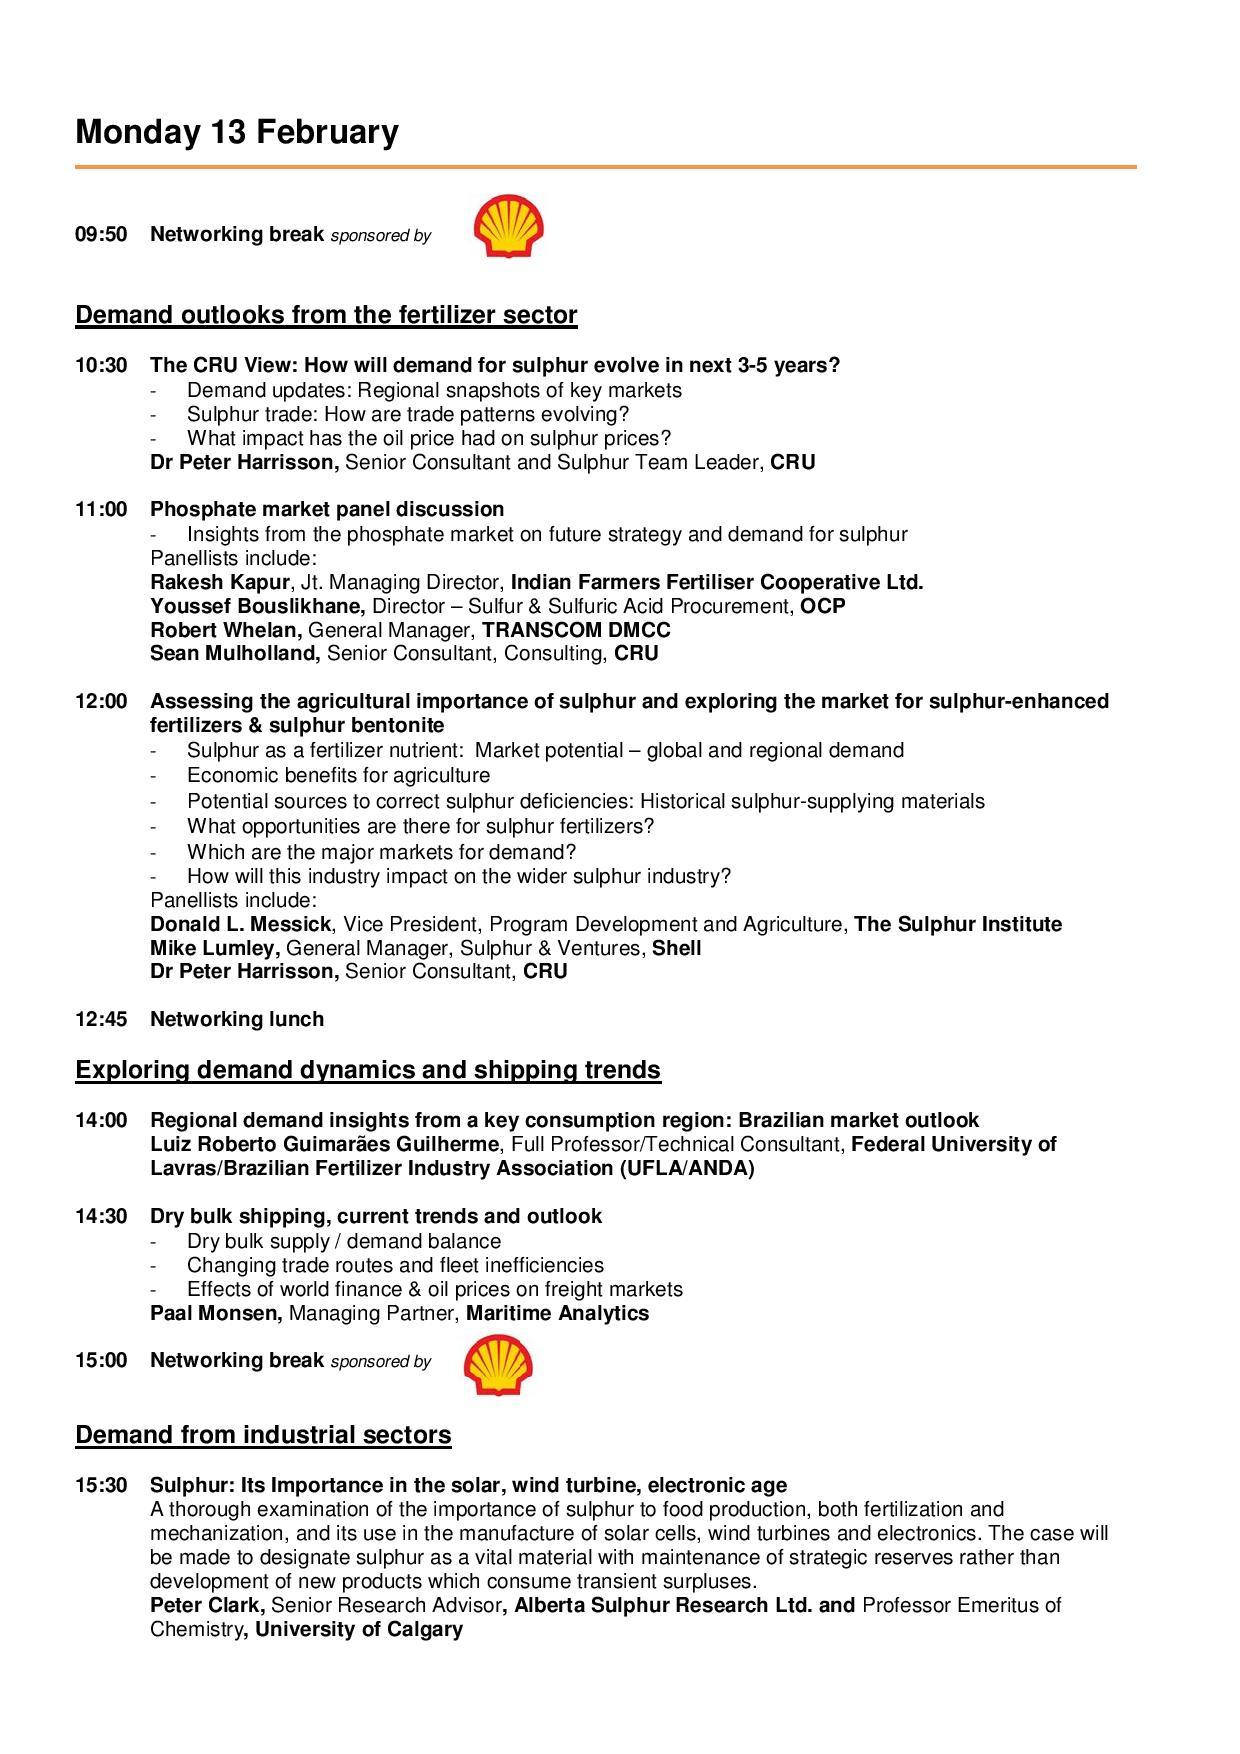 SUME4_-_Agenda_1_-_USE-page-003